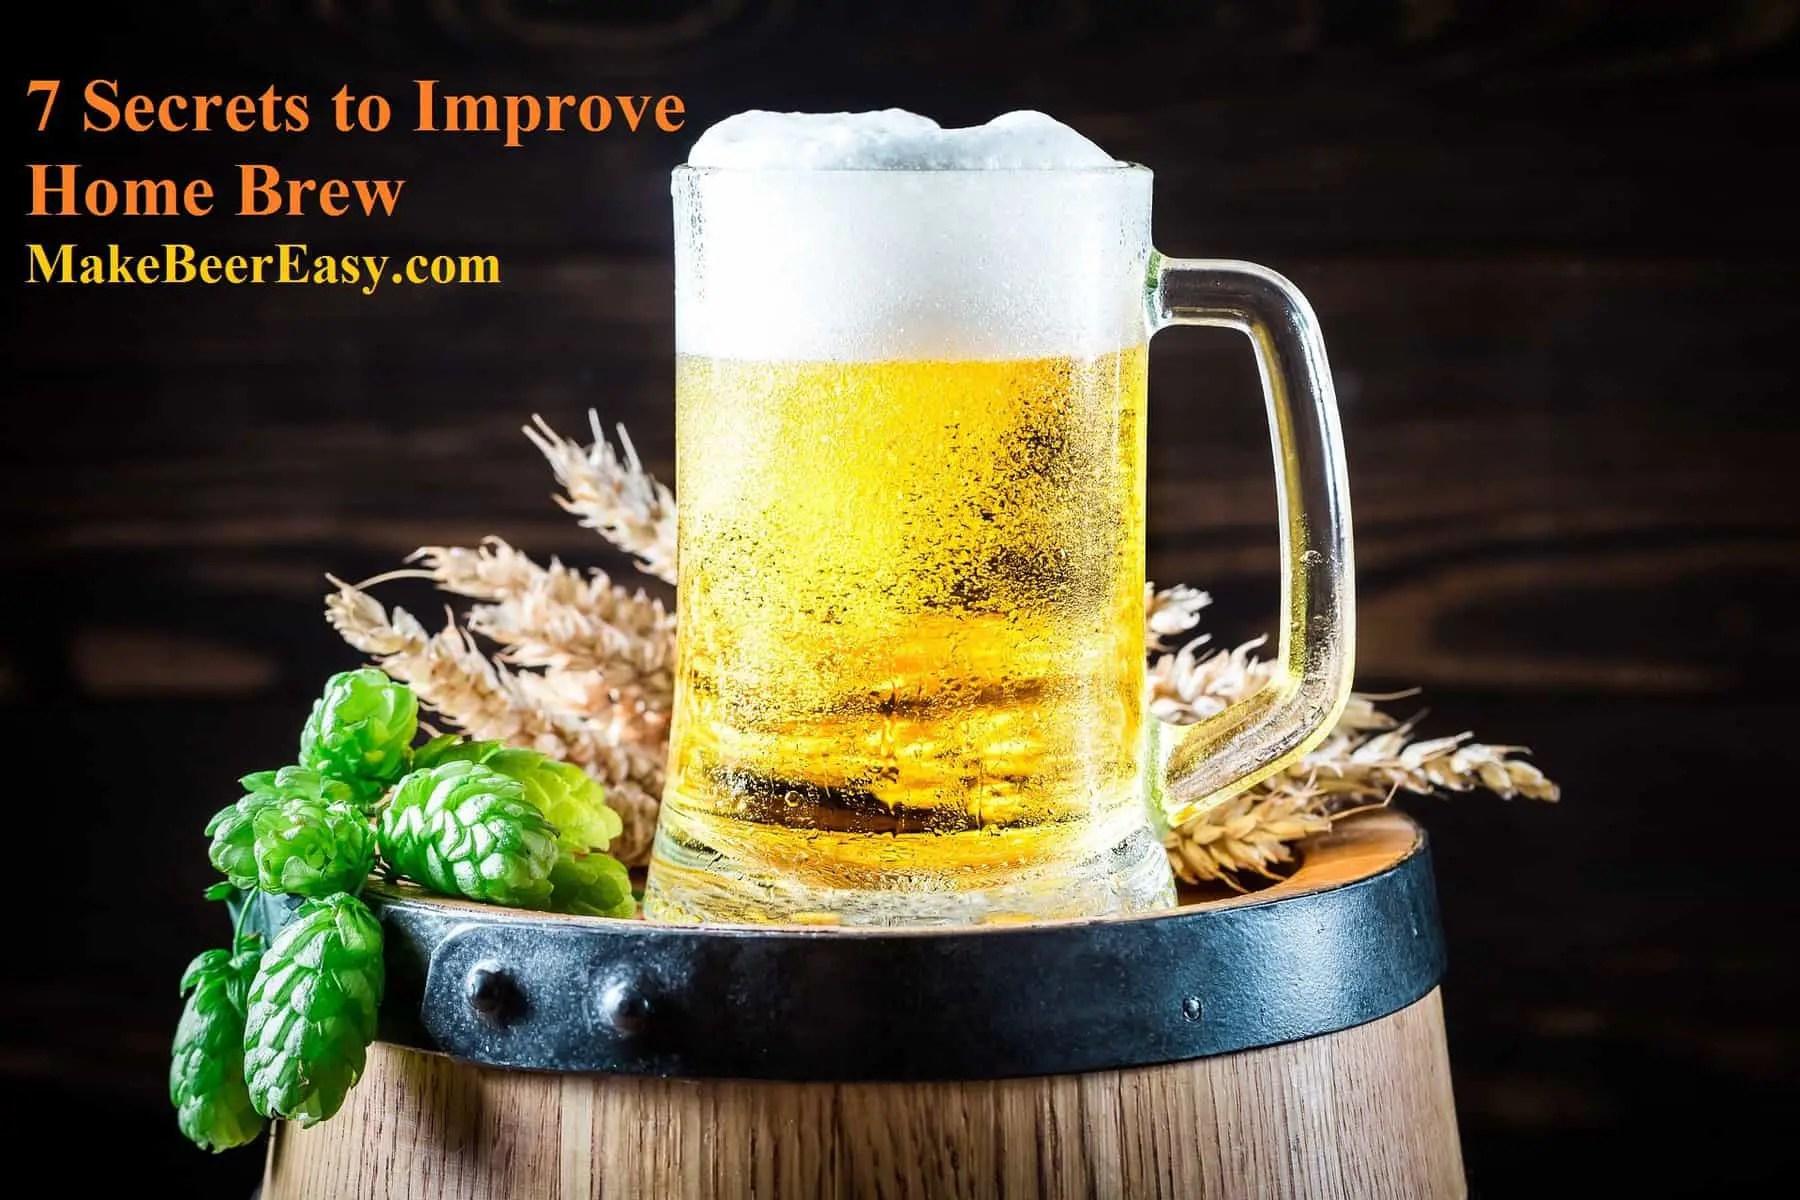 Home Brewed Beer Siting on Wooden Keg